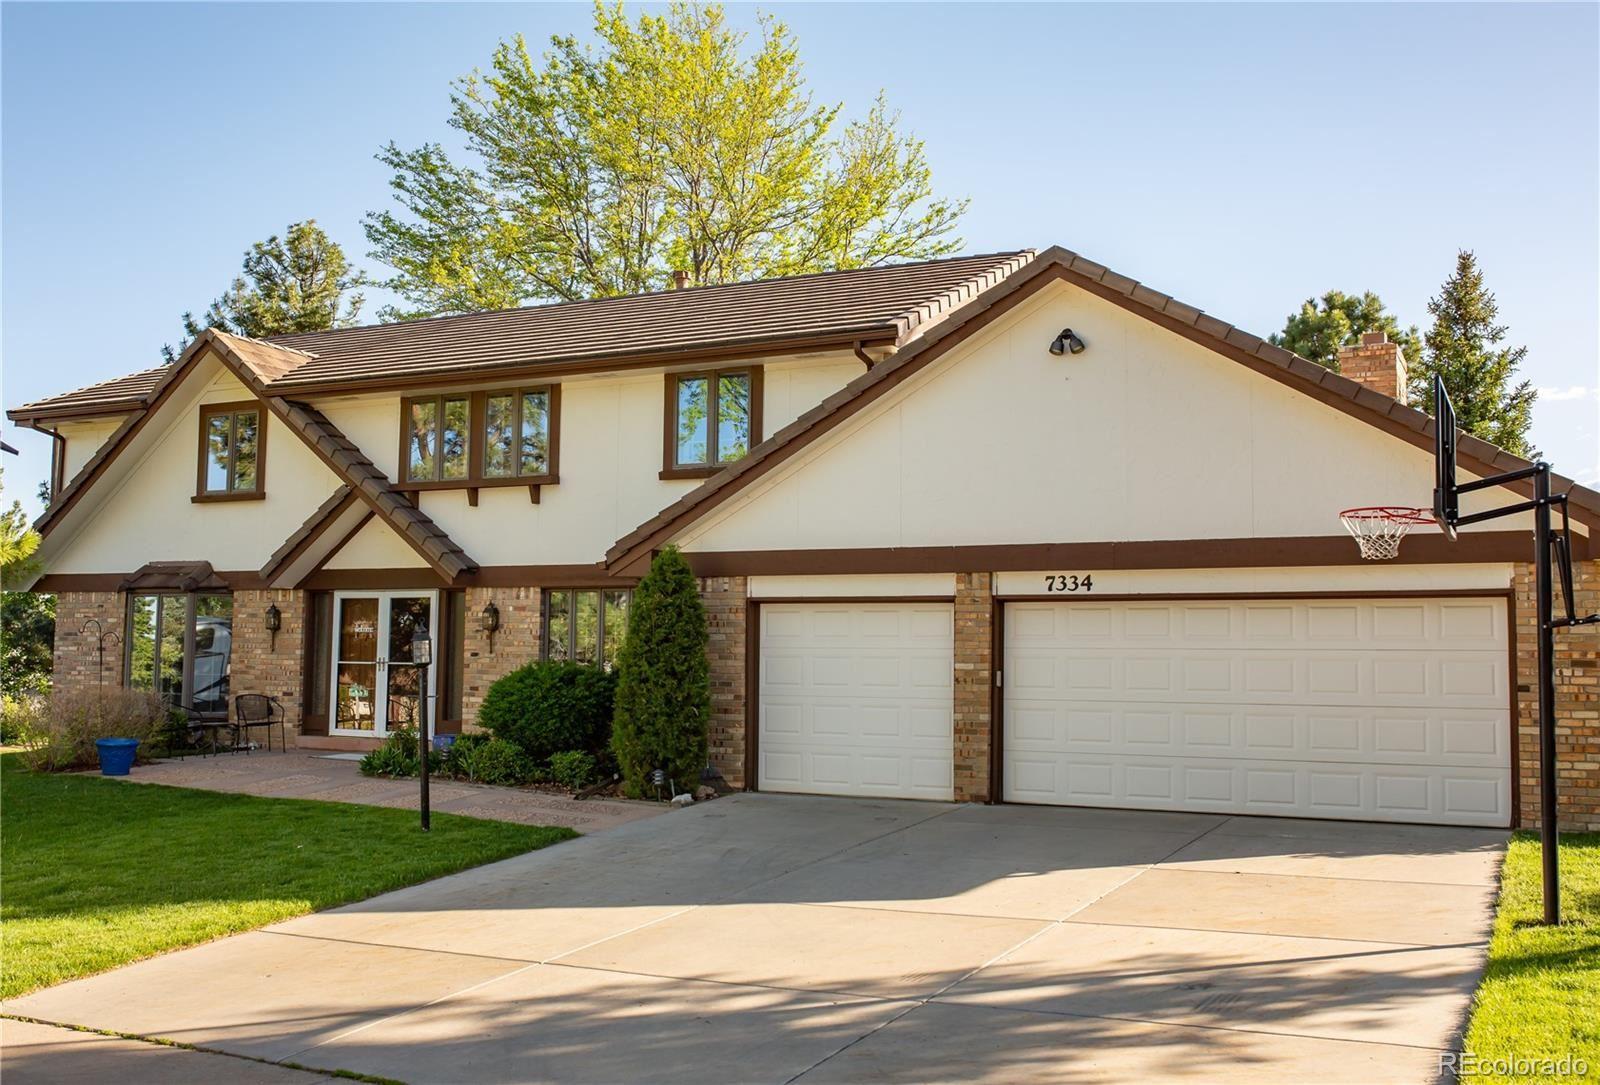 7334 W Walden Drive, Littleton, CO 80128 - #: 6489362